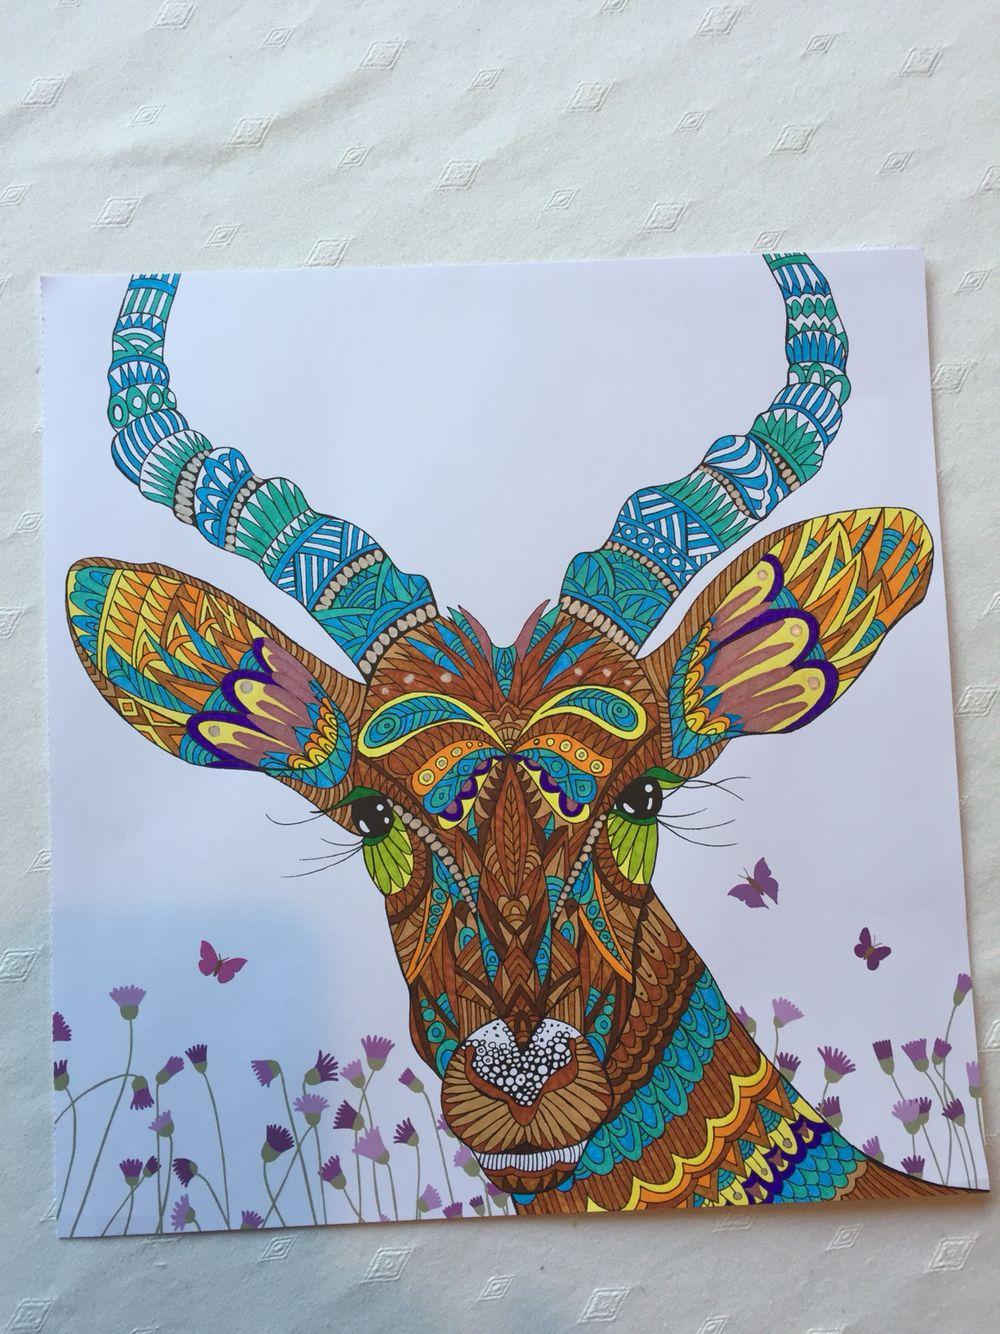 Pin de Gaby Montoya Sancho en Arte terapia   Pinterest   Colorear ...